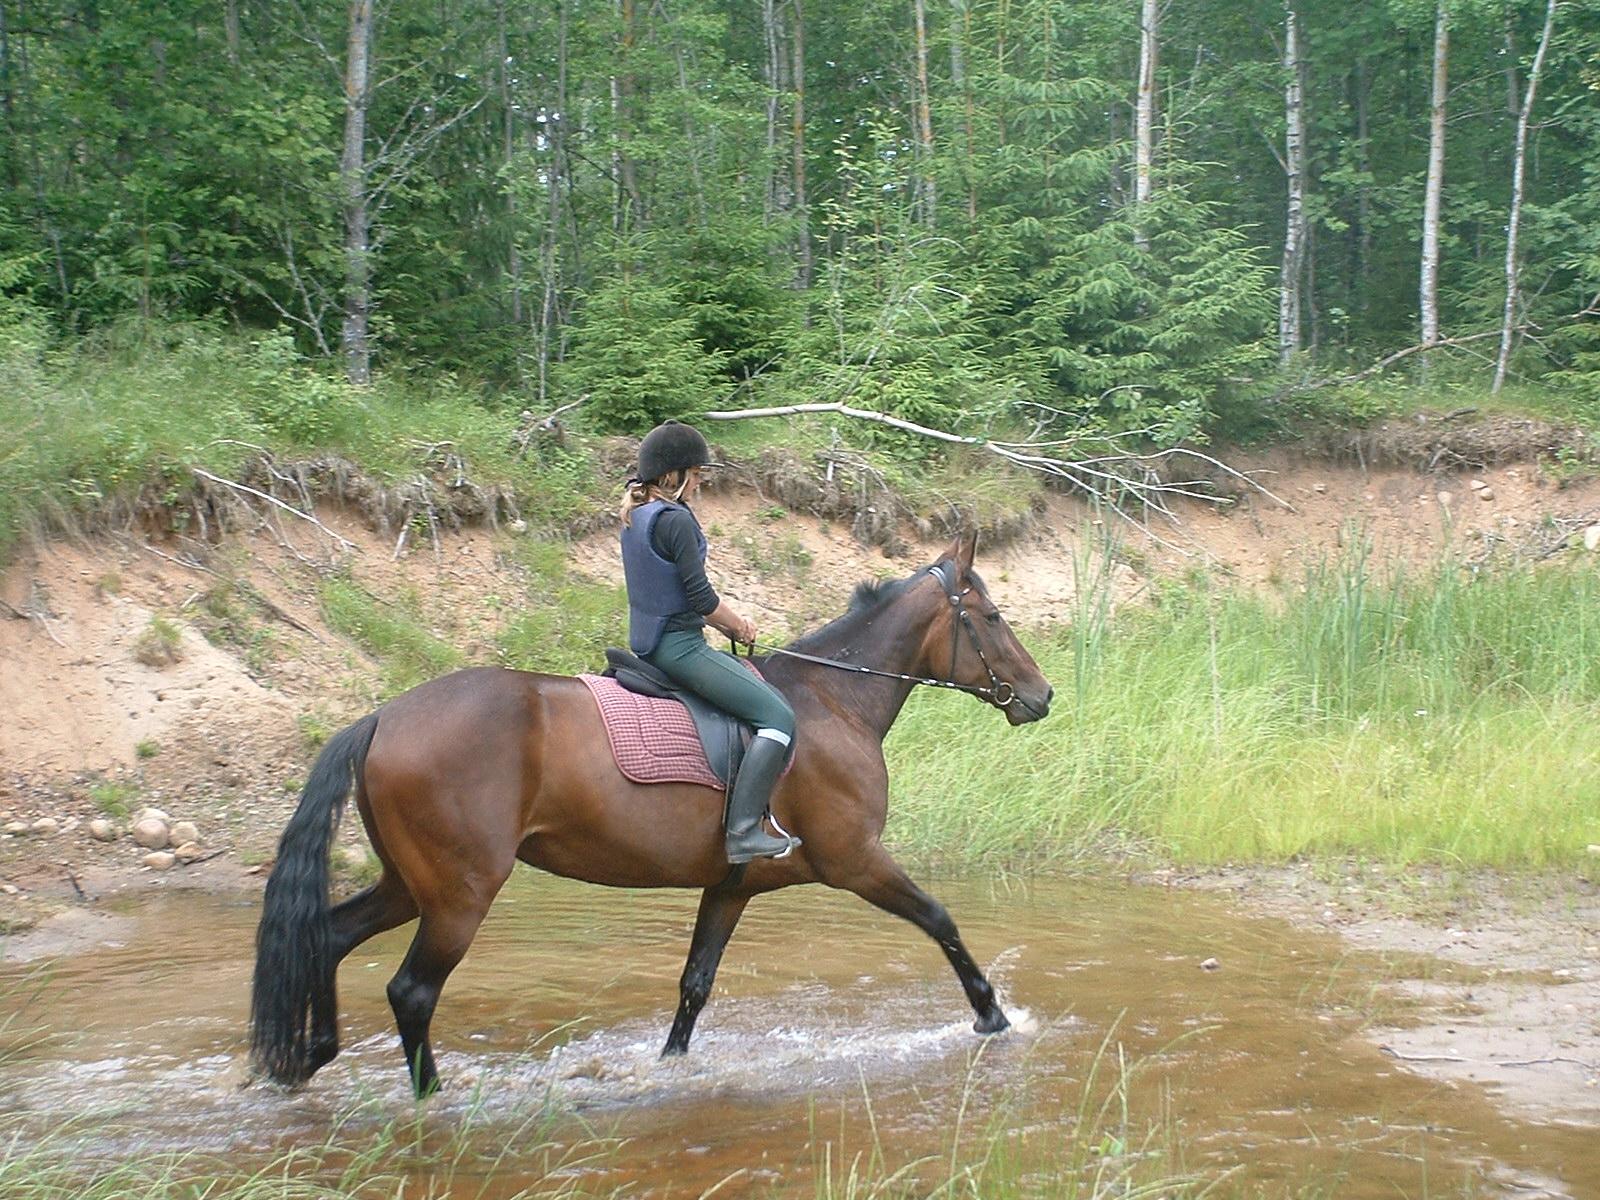 Ridning i naturen - Natural Horsemanship